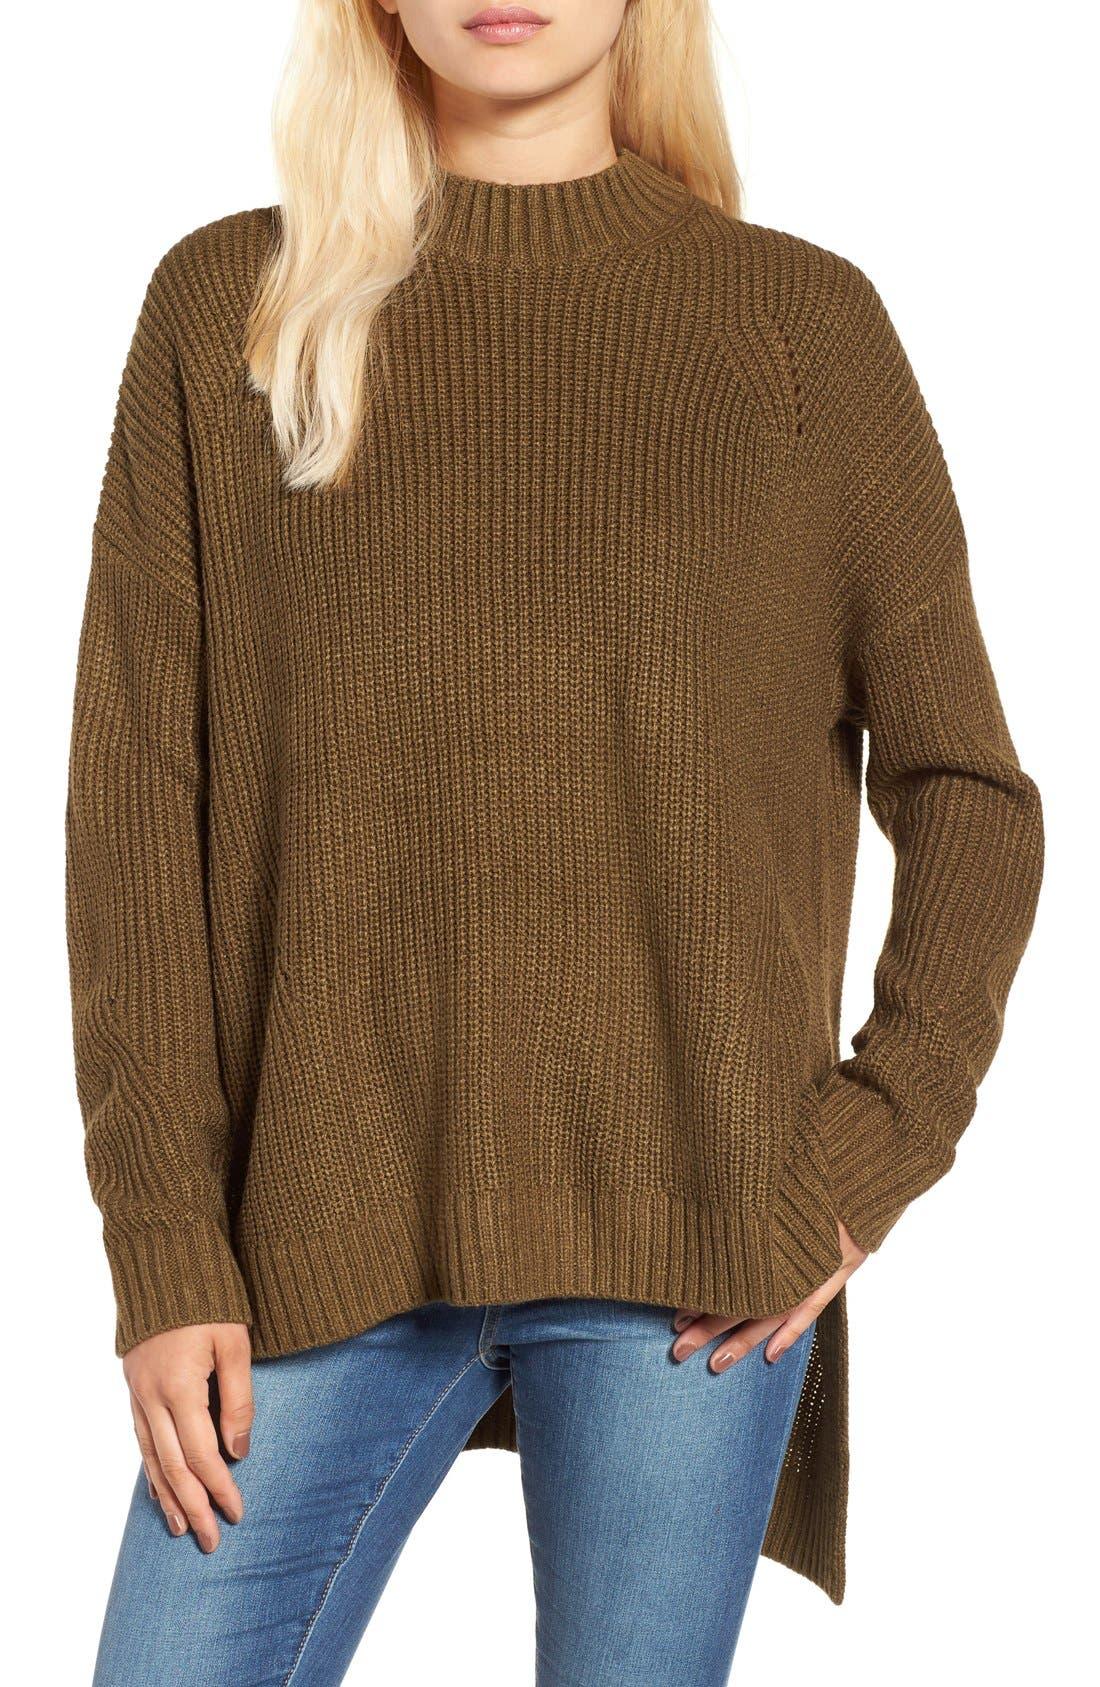 Alternate Image 1 Selected - BP. Mock Neck Shaker Stitch Pullover